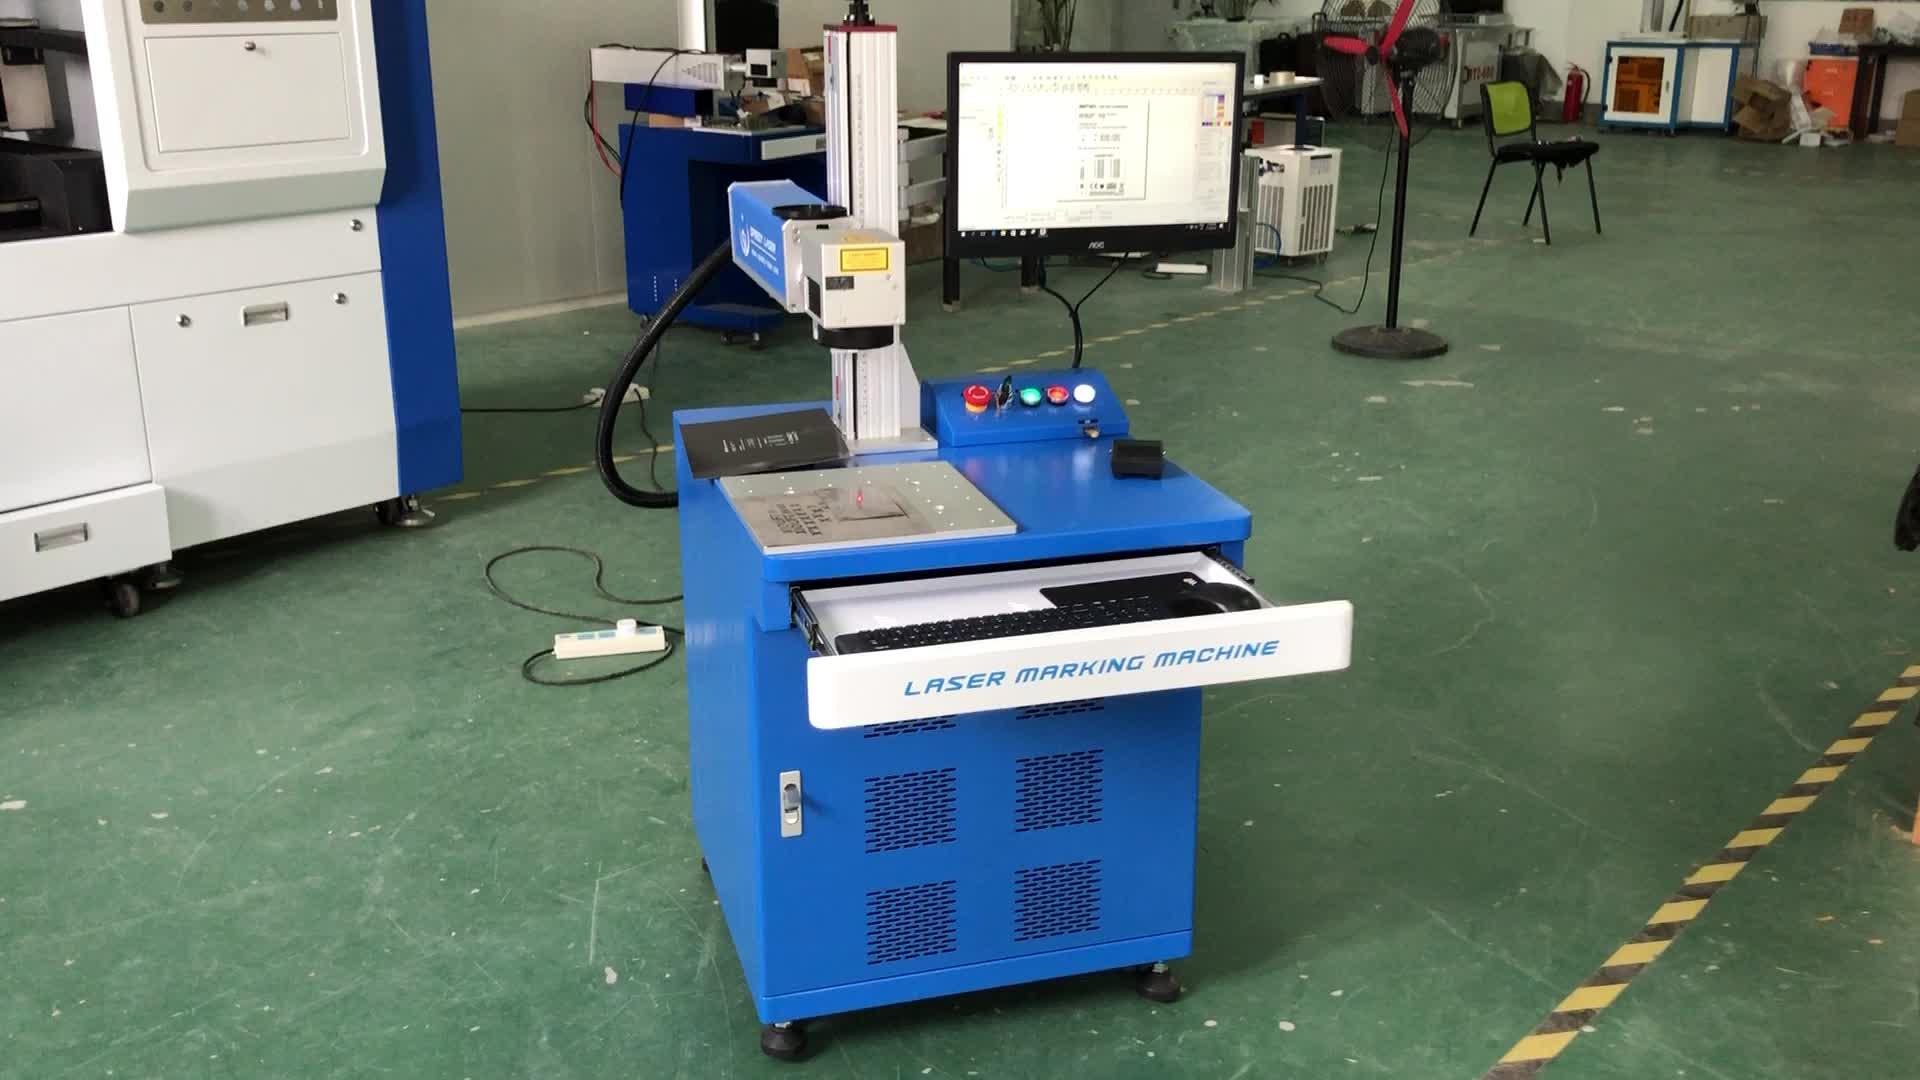 Raycus IPG 30W 50W 100W fibra laser di marcatura macchina 50W 100W macchina per incisione laser a fibra 50W 100W